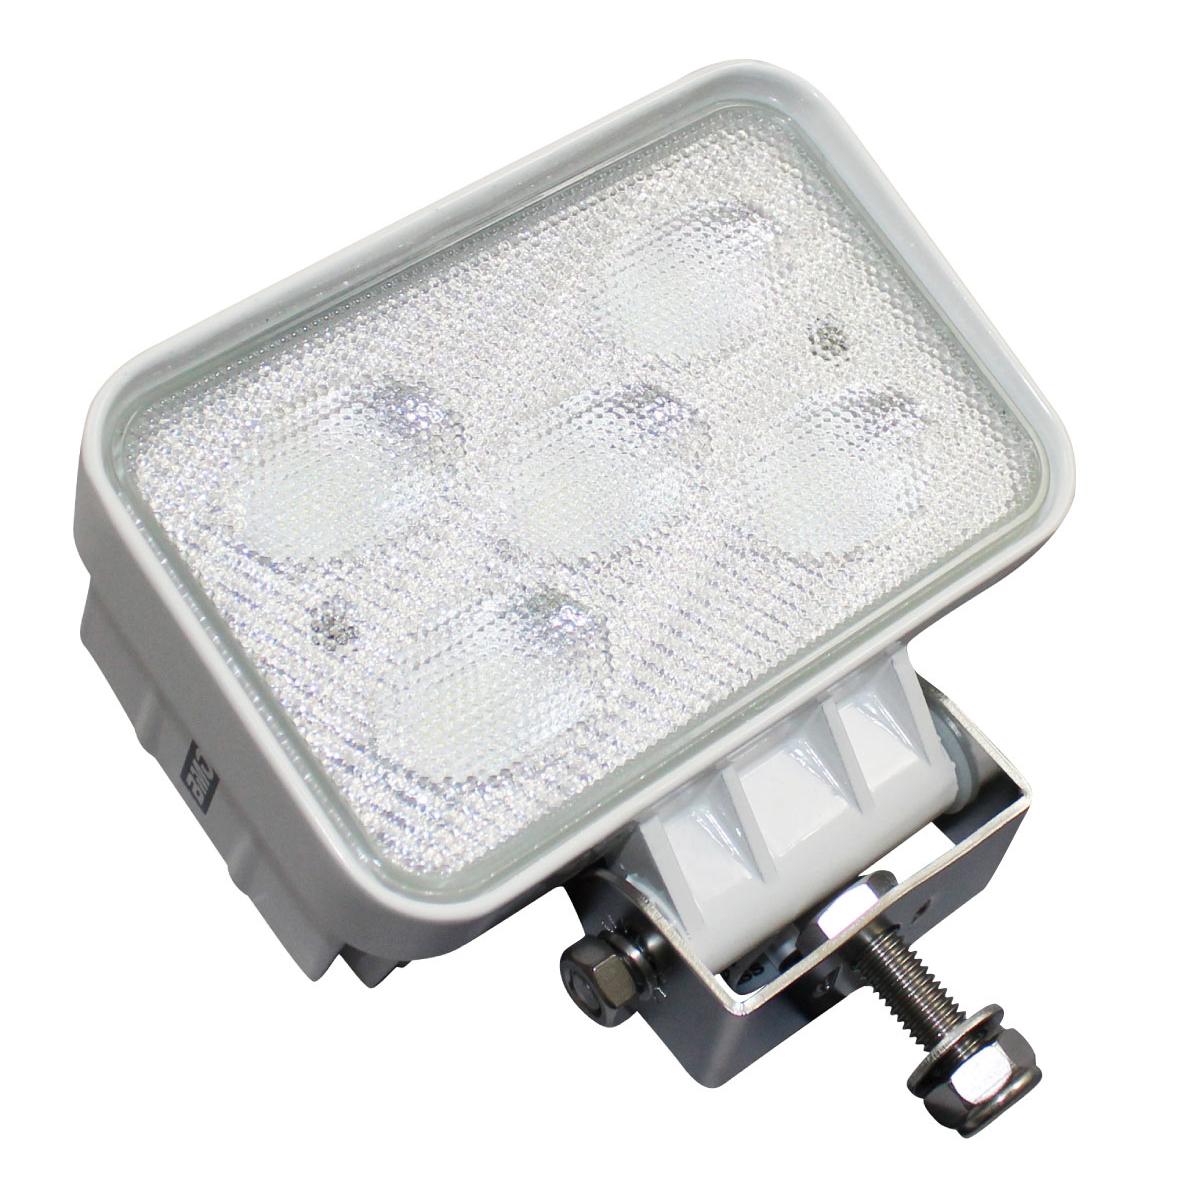 BMO JAPAN 船舶用 拡散ライト 作業灯 スーパーLEDライト5灯 船舶用